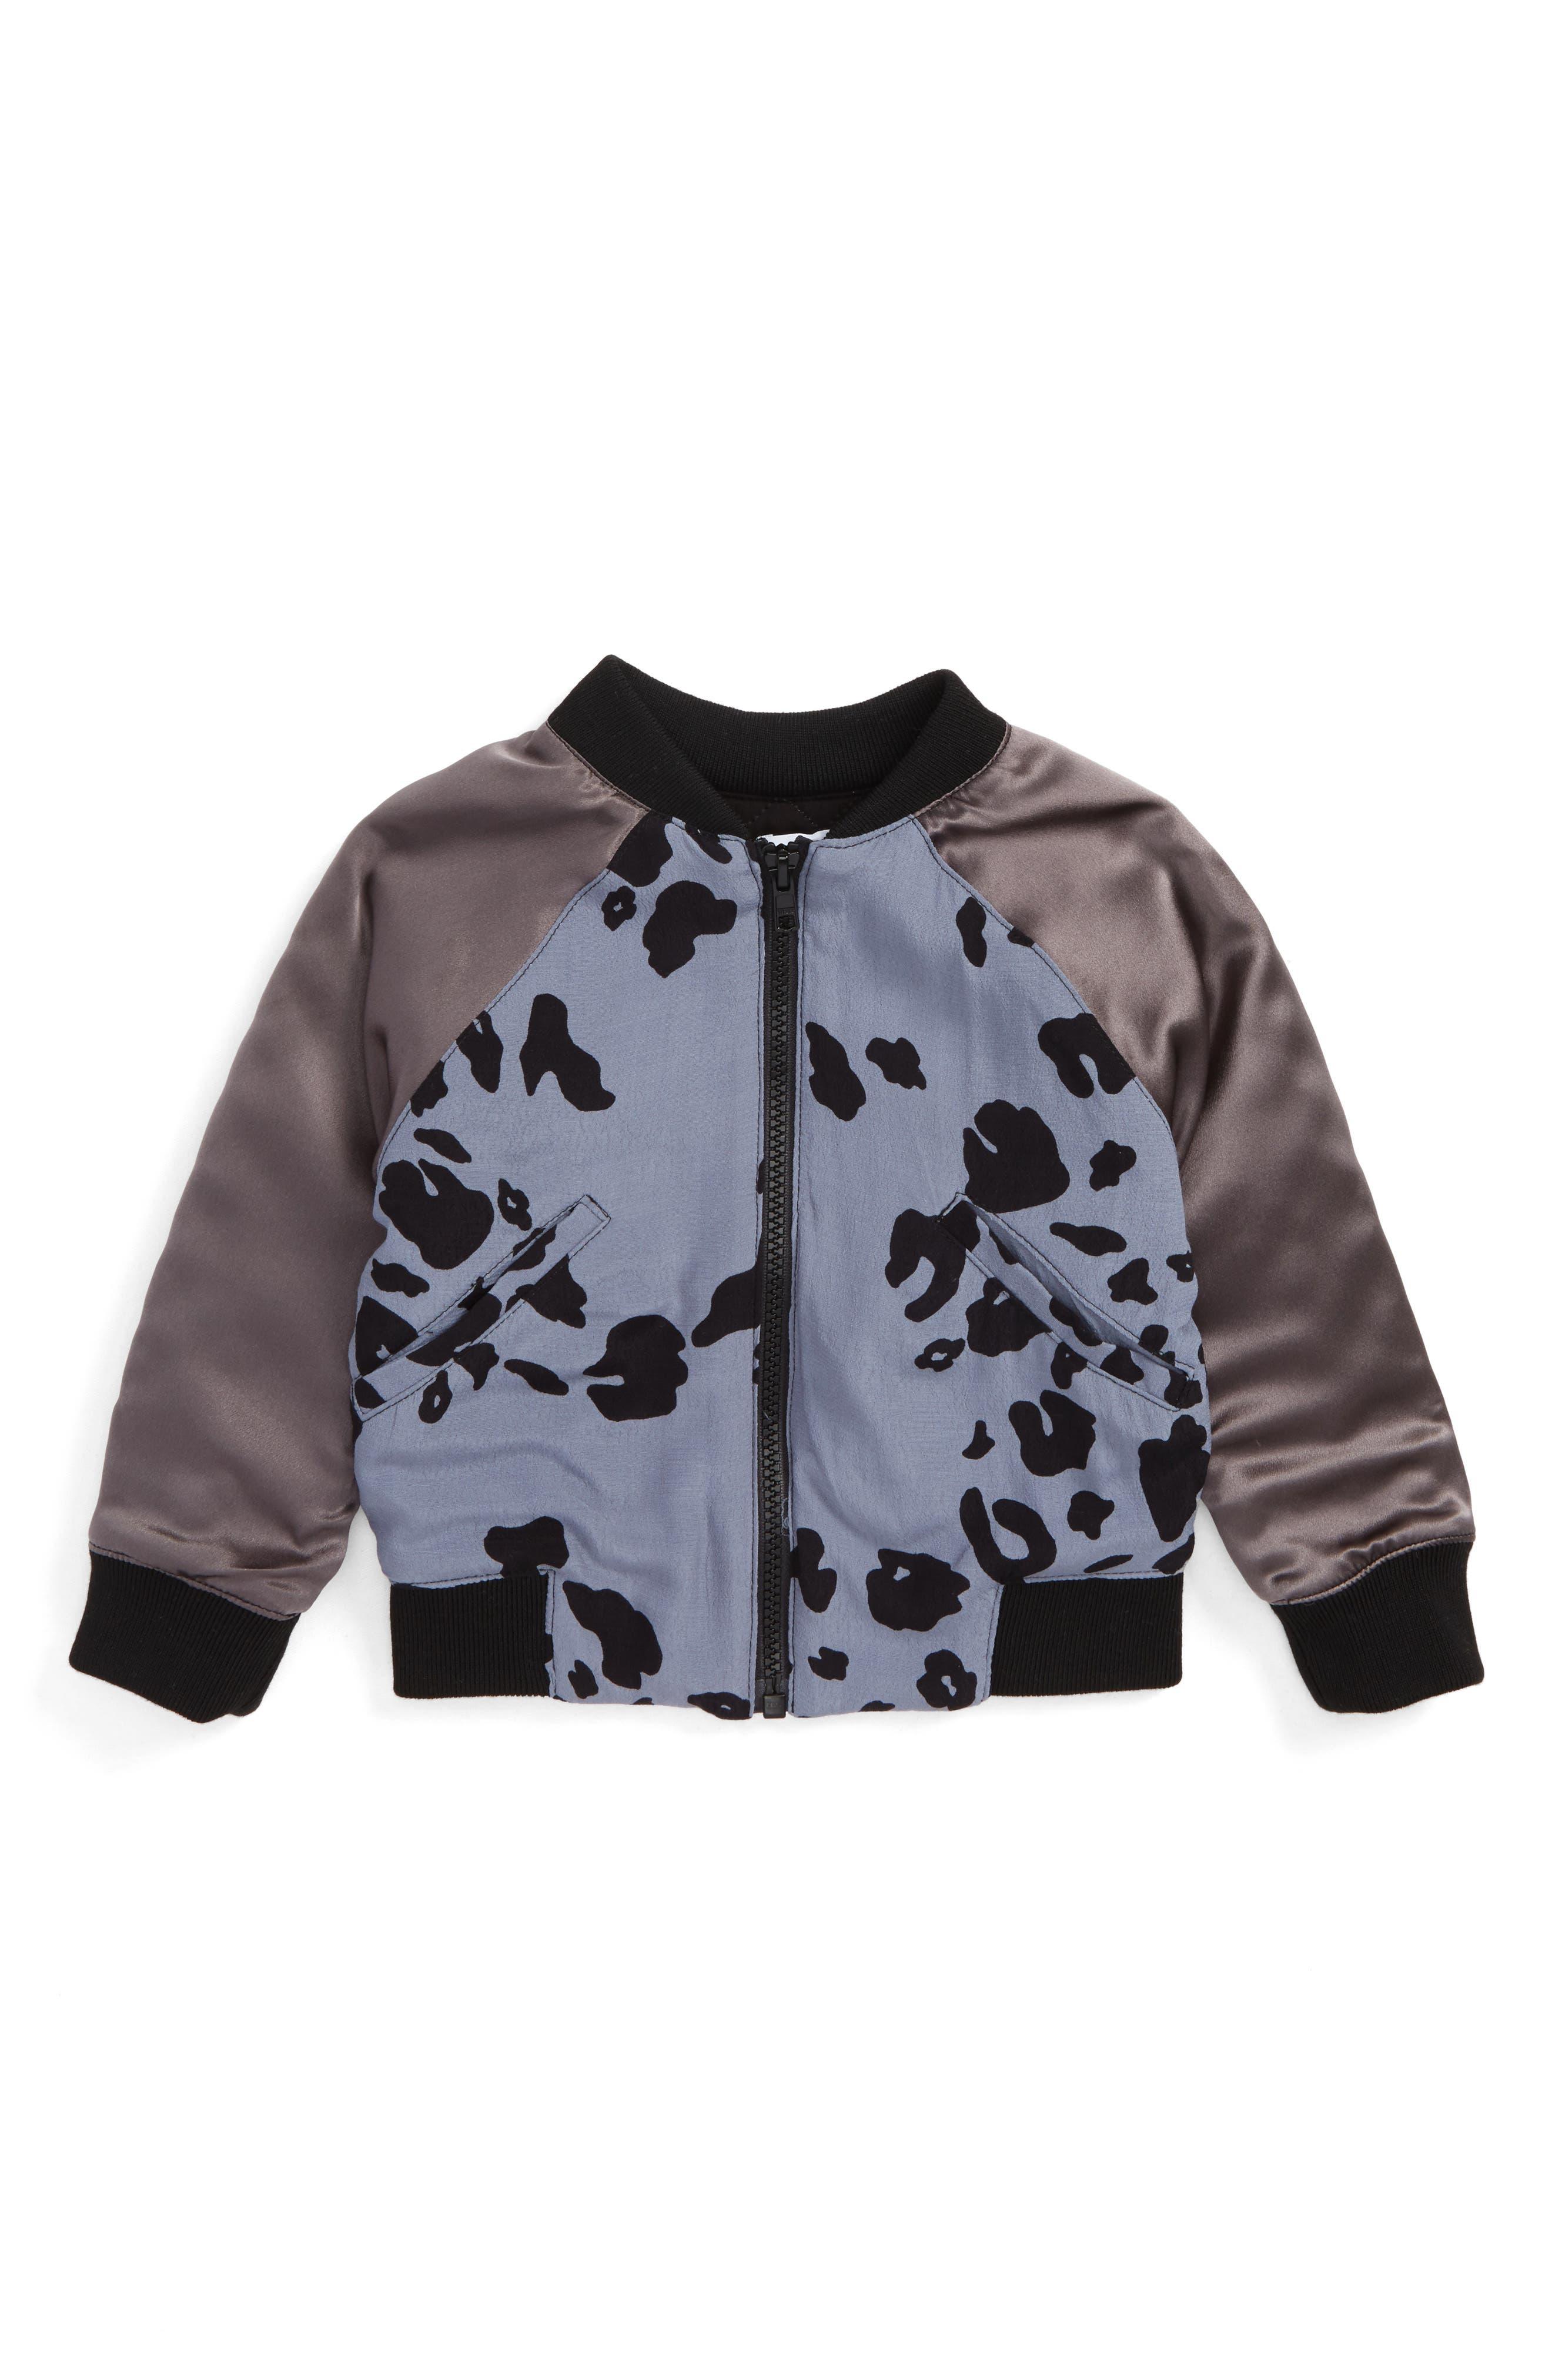 Tatum Bomber Jacket,                         Main,                         color, Cheetah W/ Black